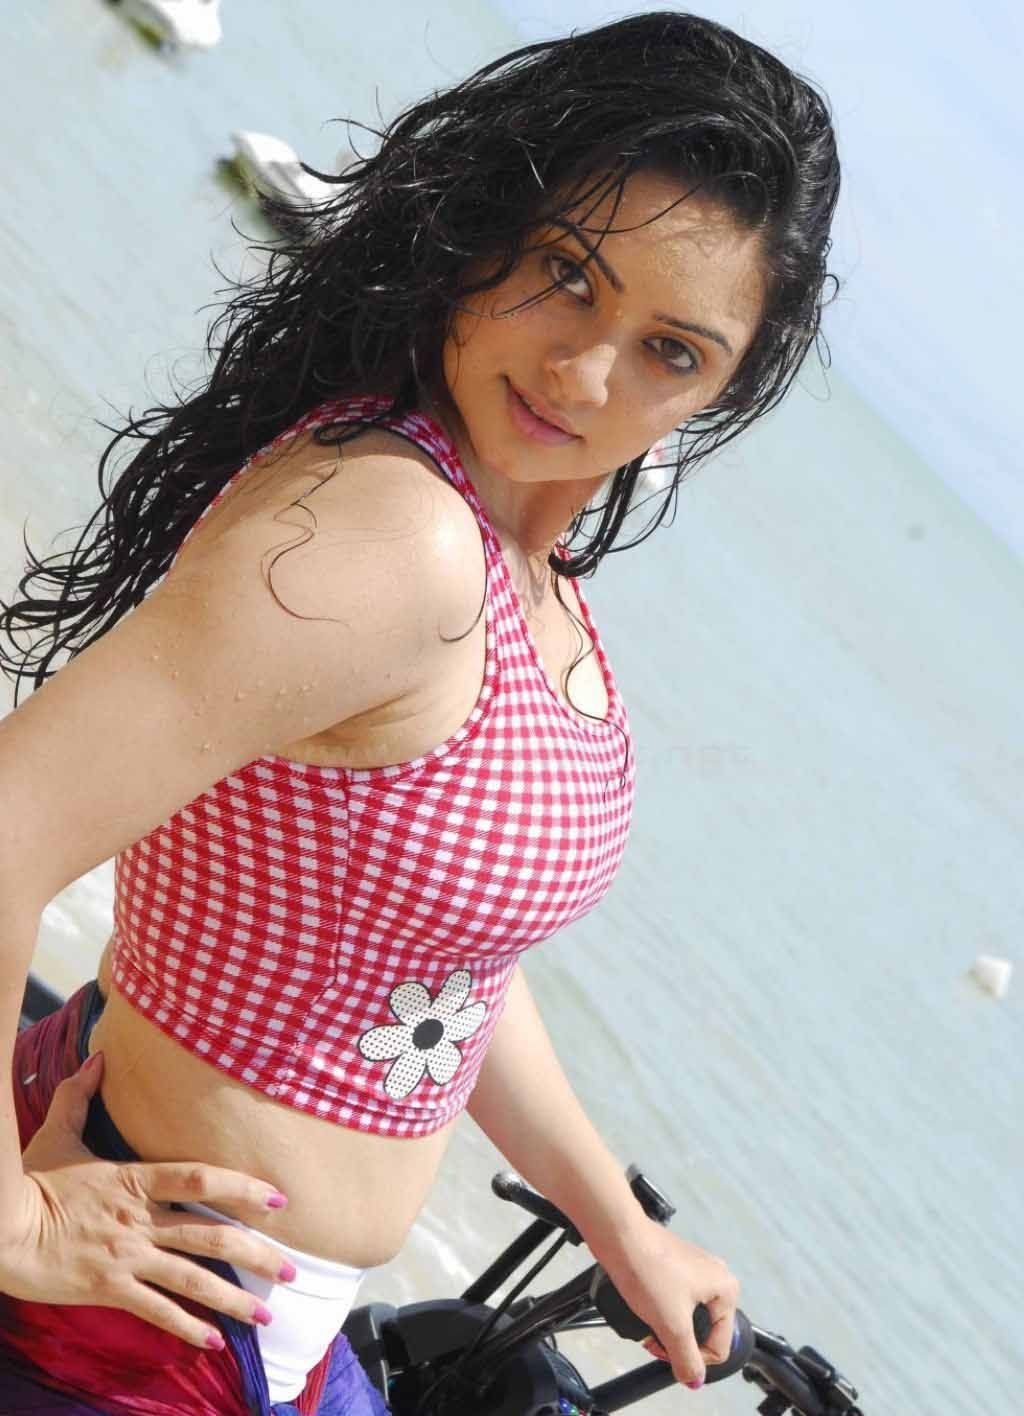 http://4.bp.blogspot.com/-s3fNvT0vVnE/Tny5M95i8FI/AAAAAAAAIAA/dIcqCOtegEs/s1600/Aadu-Aata-Aadu-Kannada-super-Movie-Stills_actresspsuperoszone.blogspot.com_15.jpg?aadu-aata-aadu-movie+http: